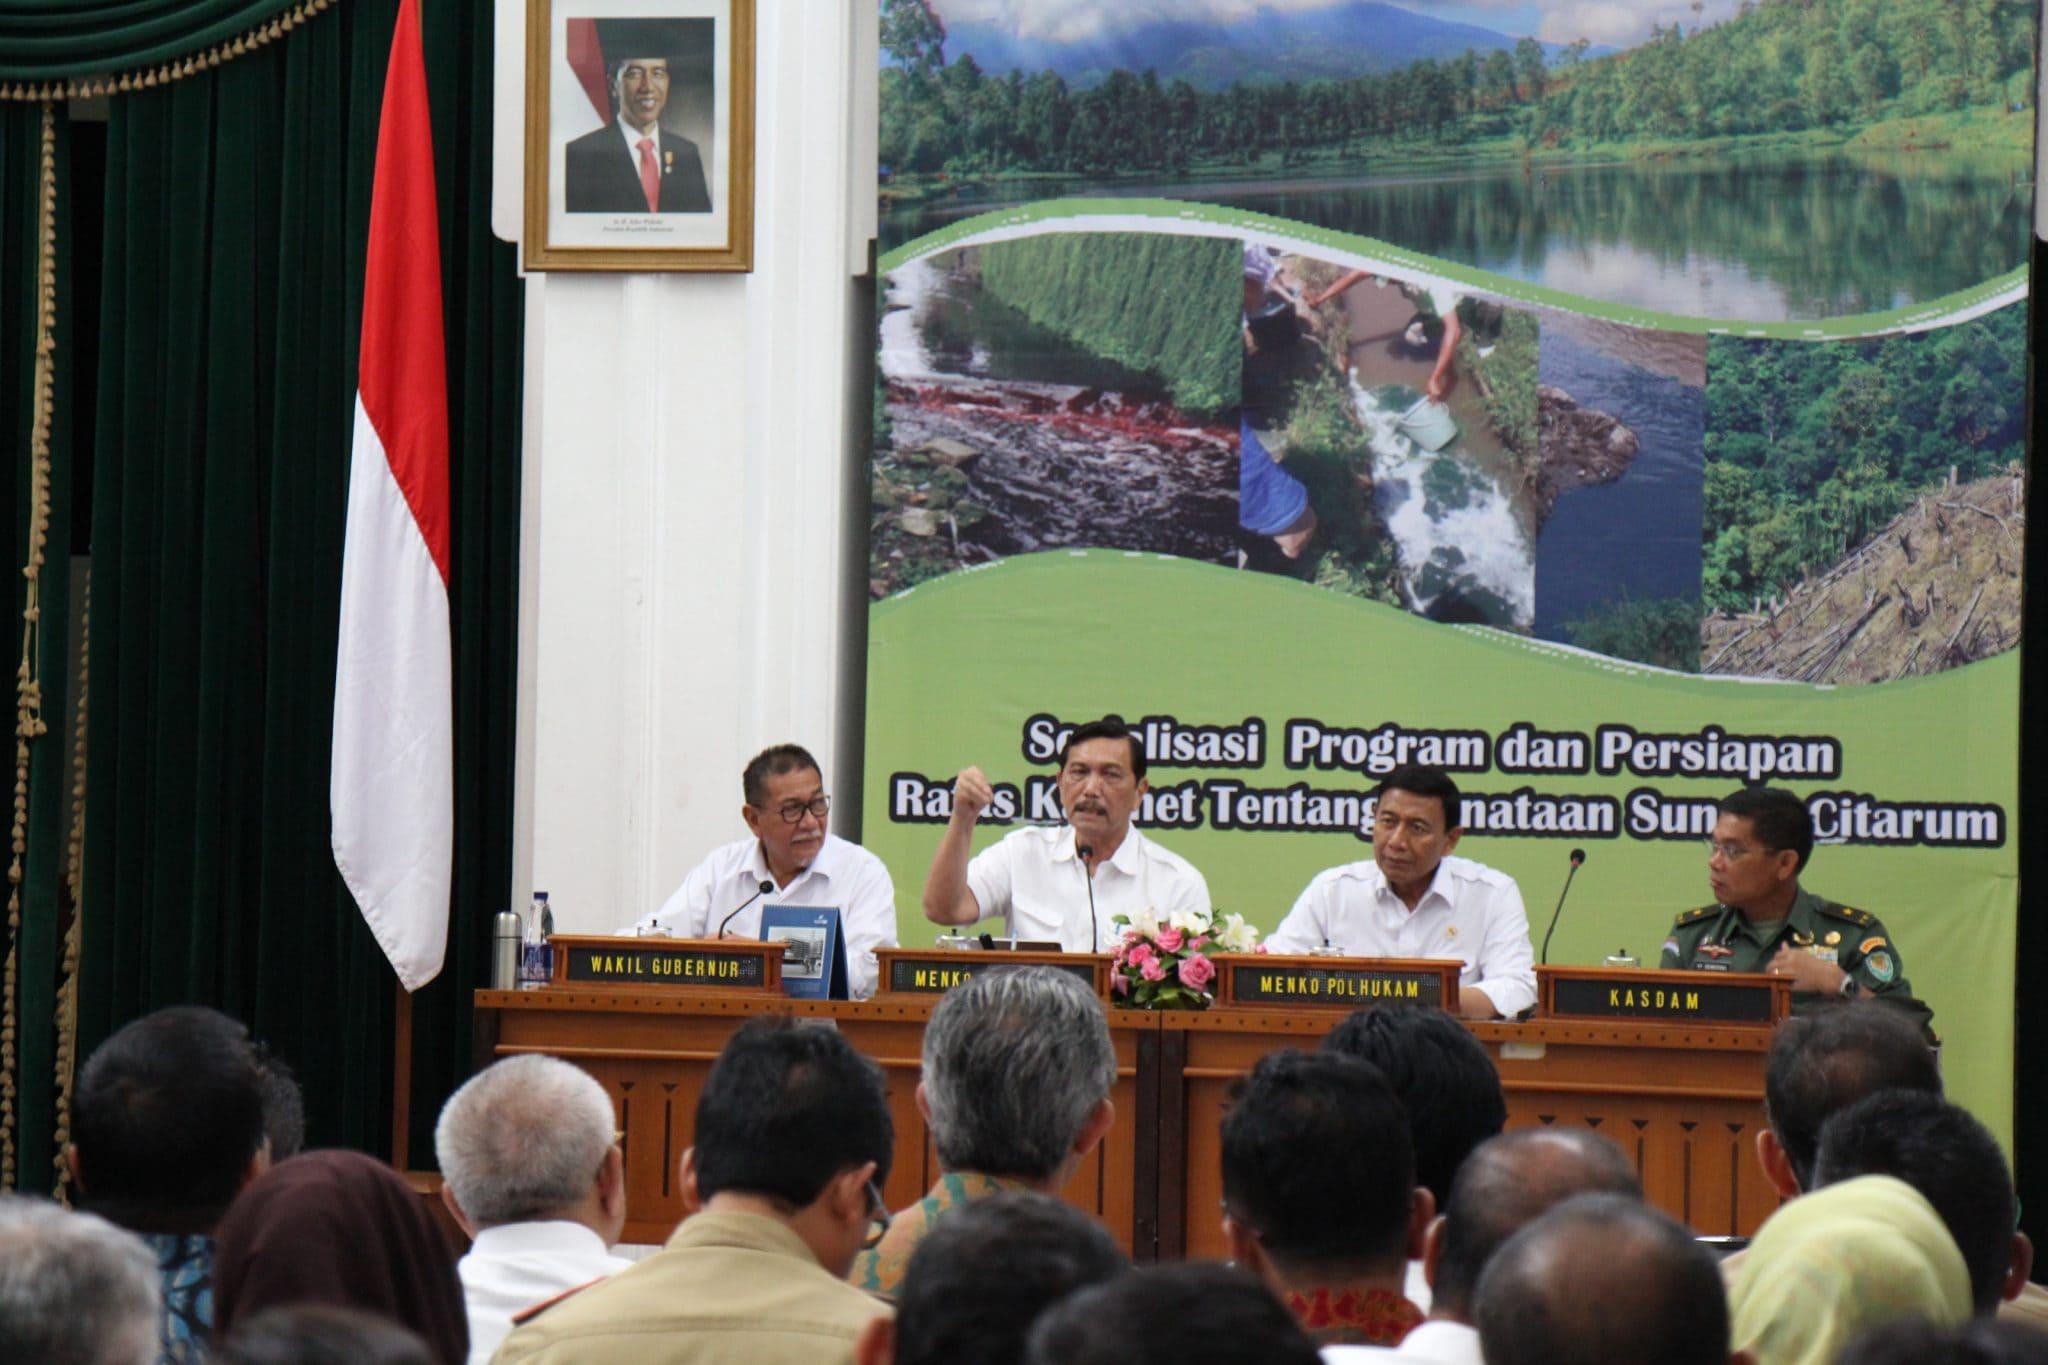 Menko Maritim Luhut B. Pandjaitan Pimpin Jalannya Rapat Koordinasi Sosialisasi Program Persiapan Ratas Kabinet Tentang Penanganan Sungai Citarum